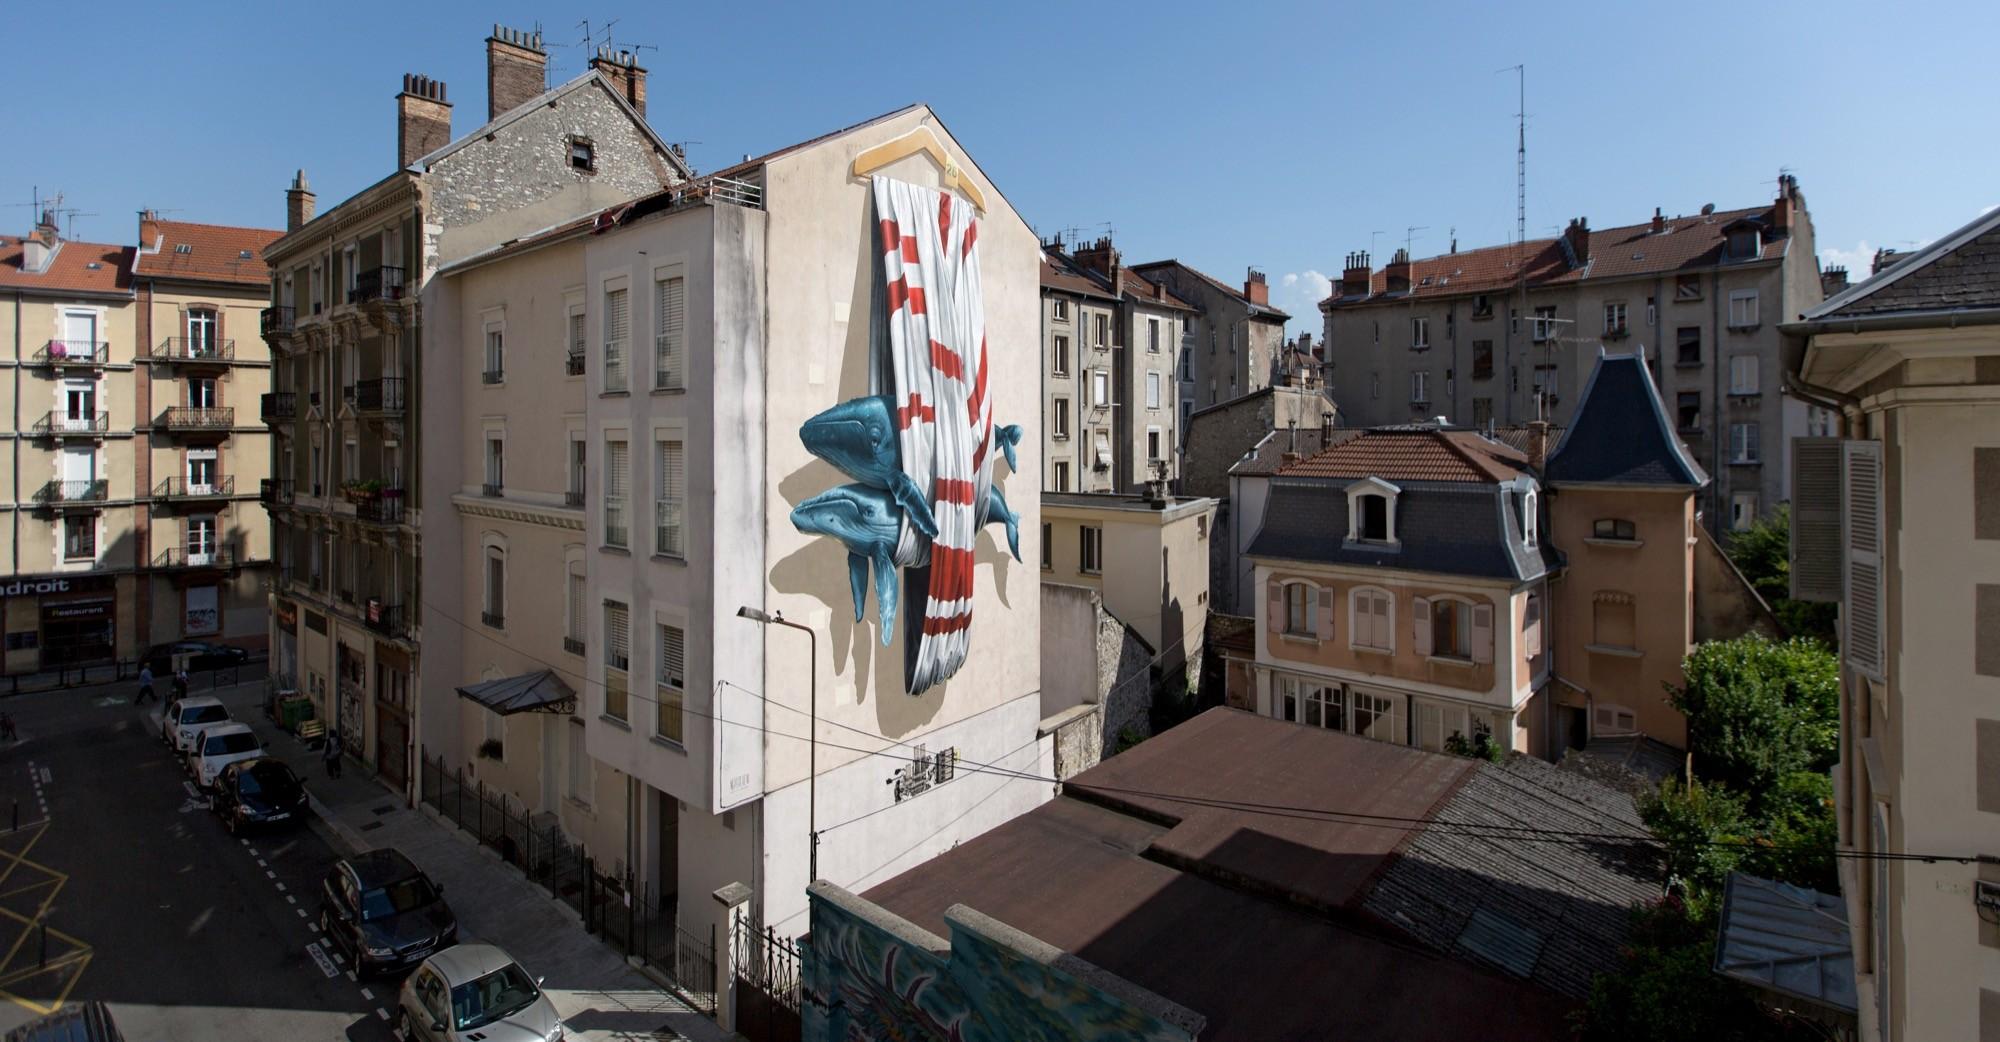 NEVERCREW - Ordering machine - Grenoble 2016 - 09